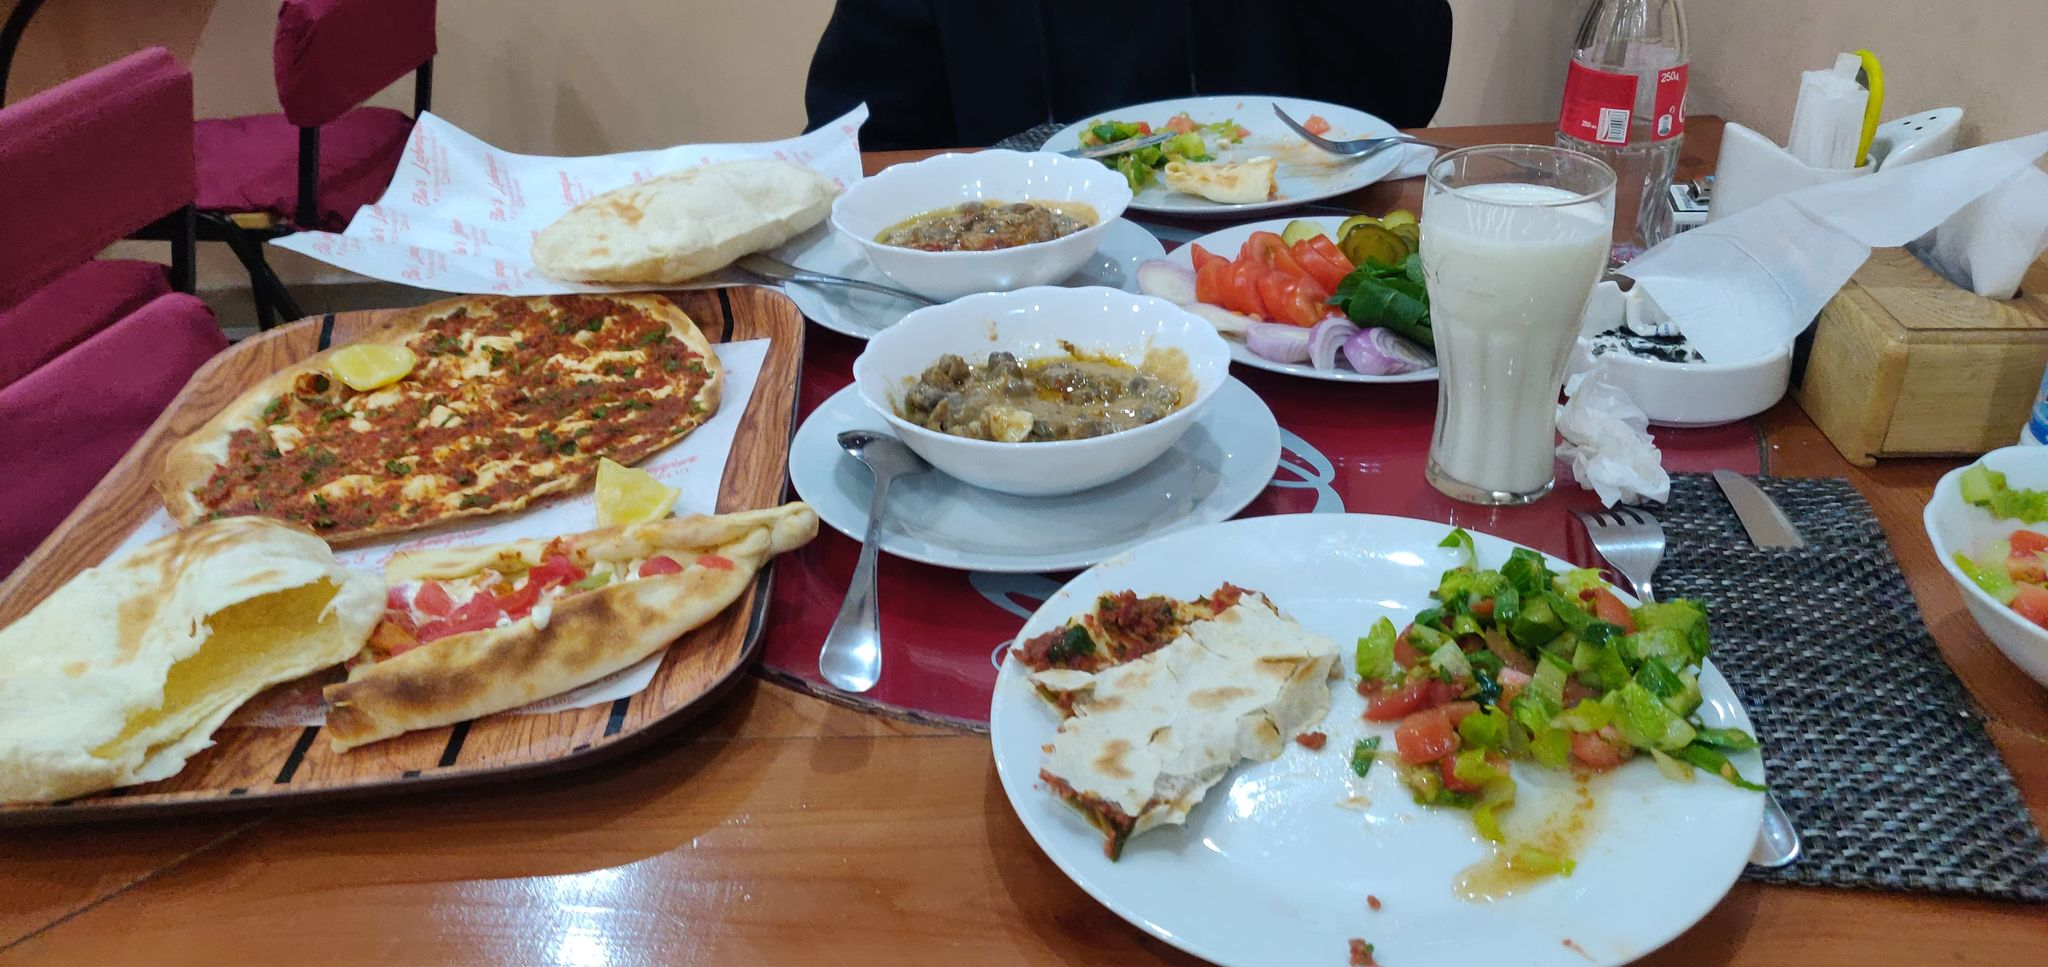 nomade repas armenie nourtiture syrienne moyen orient